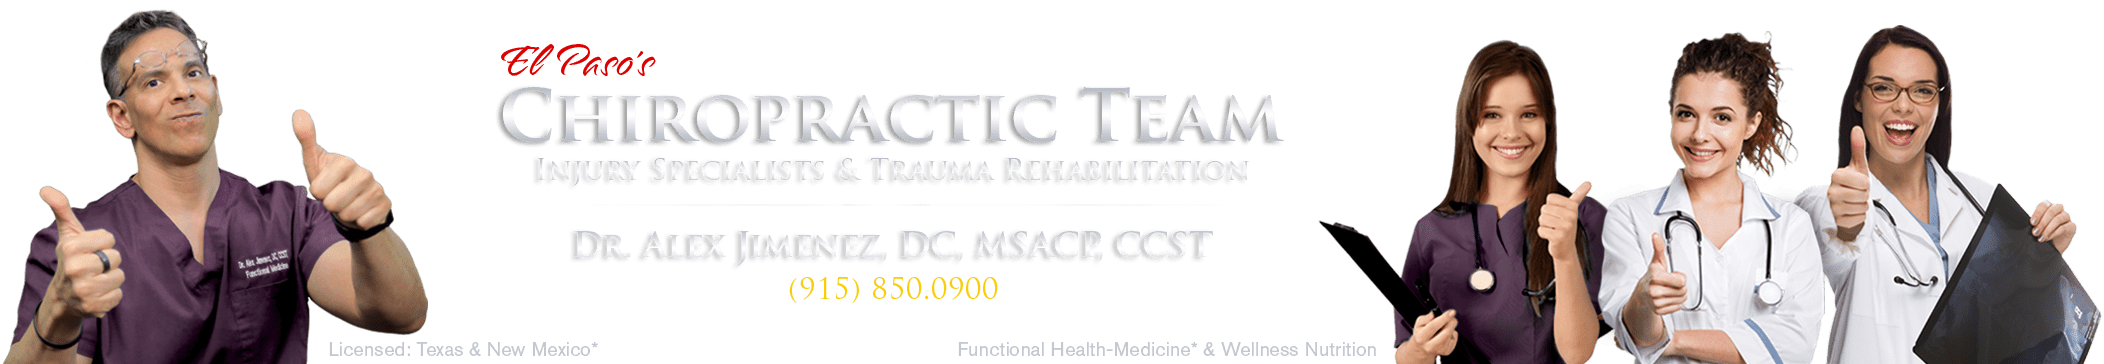 El Paso premjerinė chiropraktikos klinika 915-850-0900